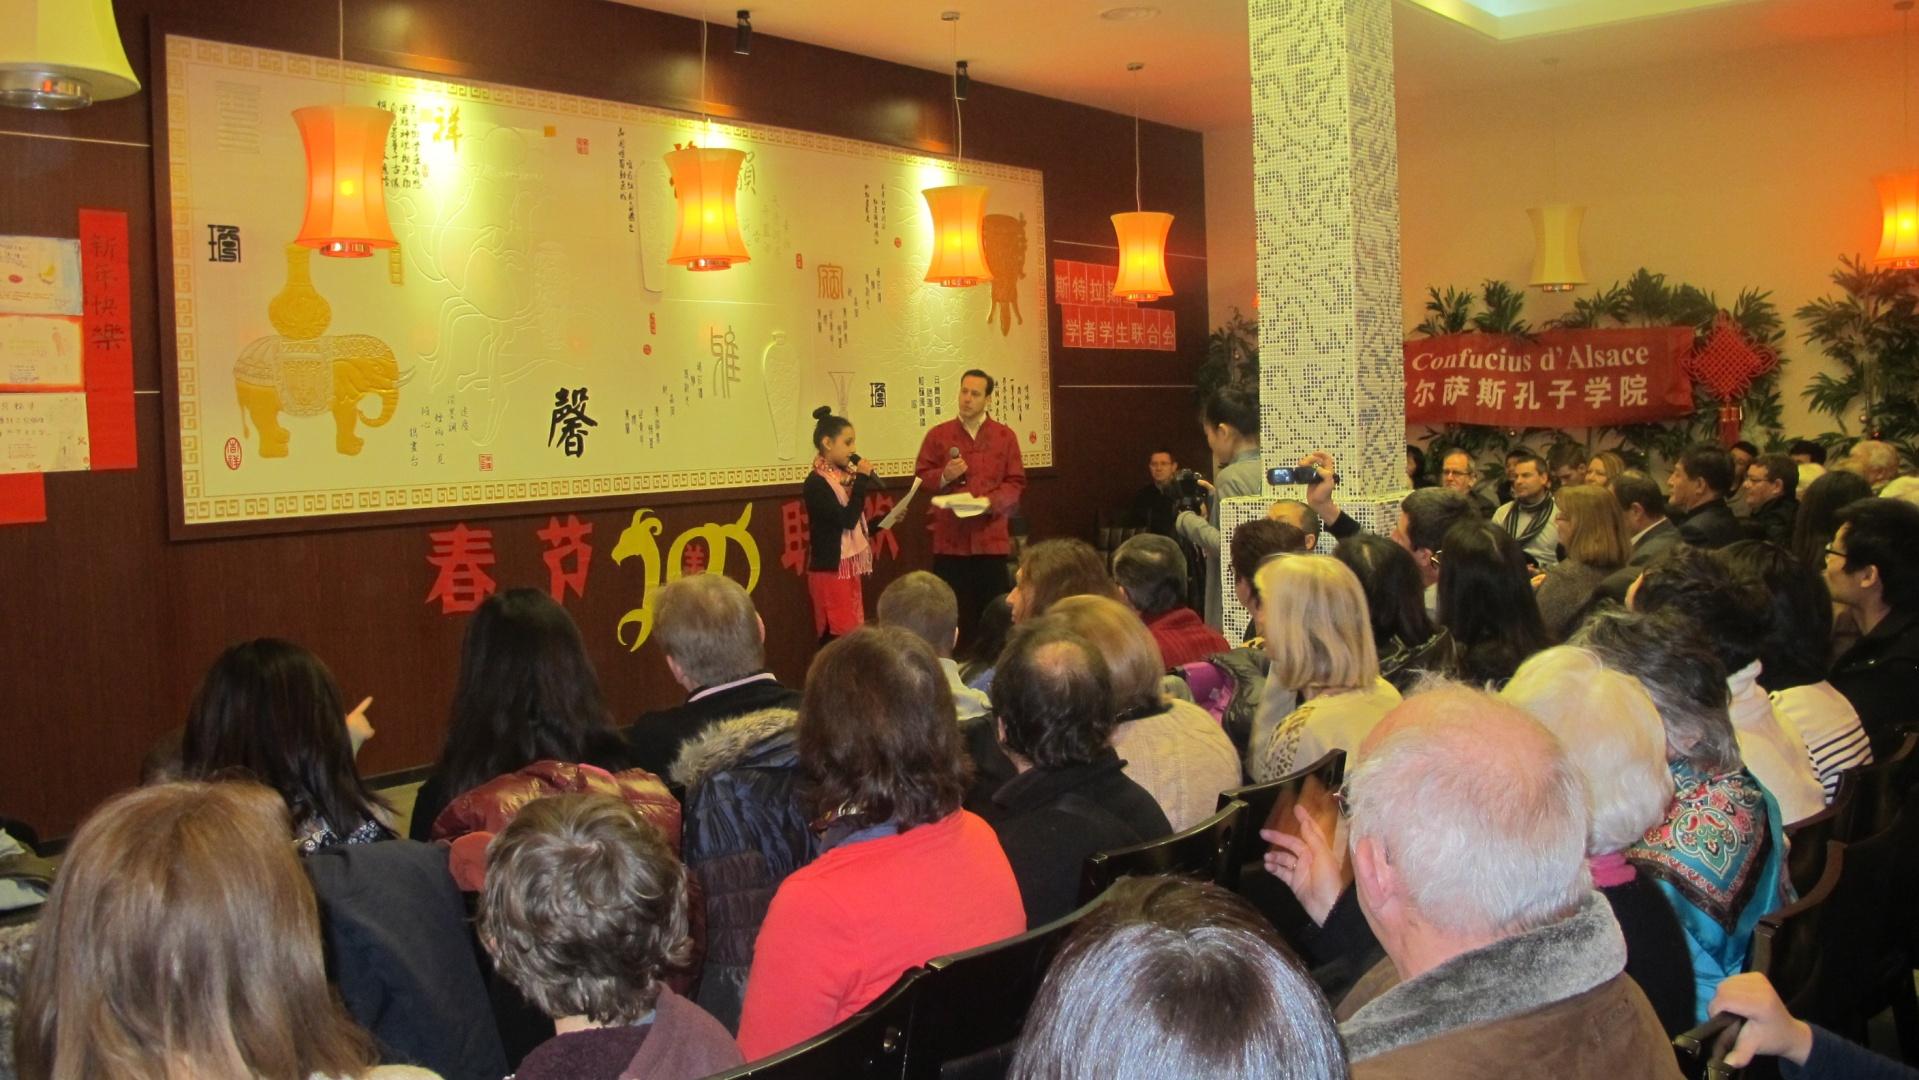 galerie nouvel an chinois 2015 strasbourg institut confucius alsace. Black Bedroom Furniture Sets. Home Design Ideas